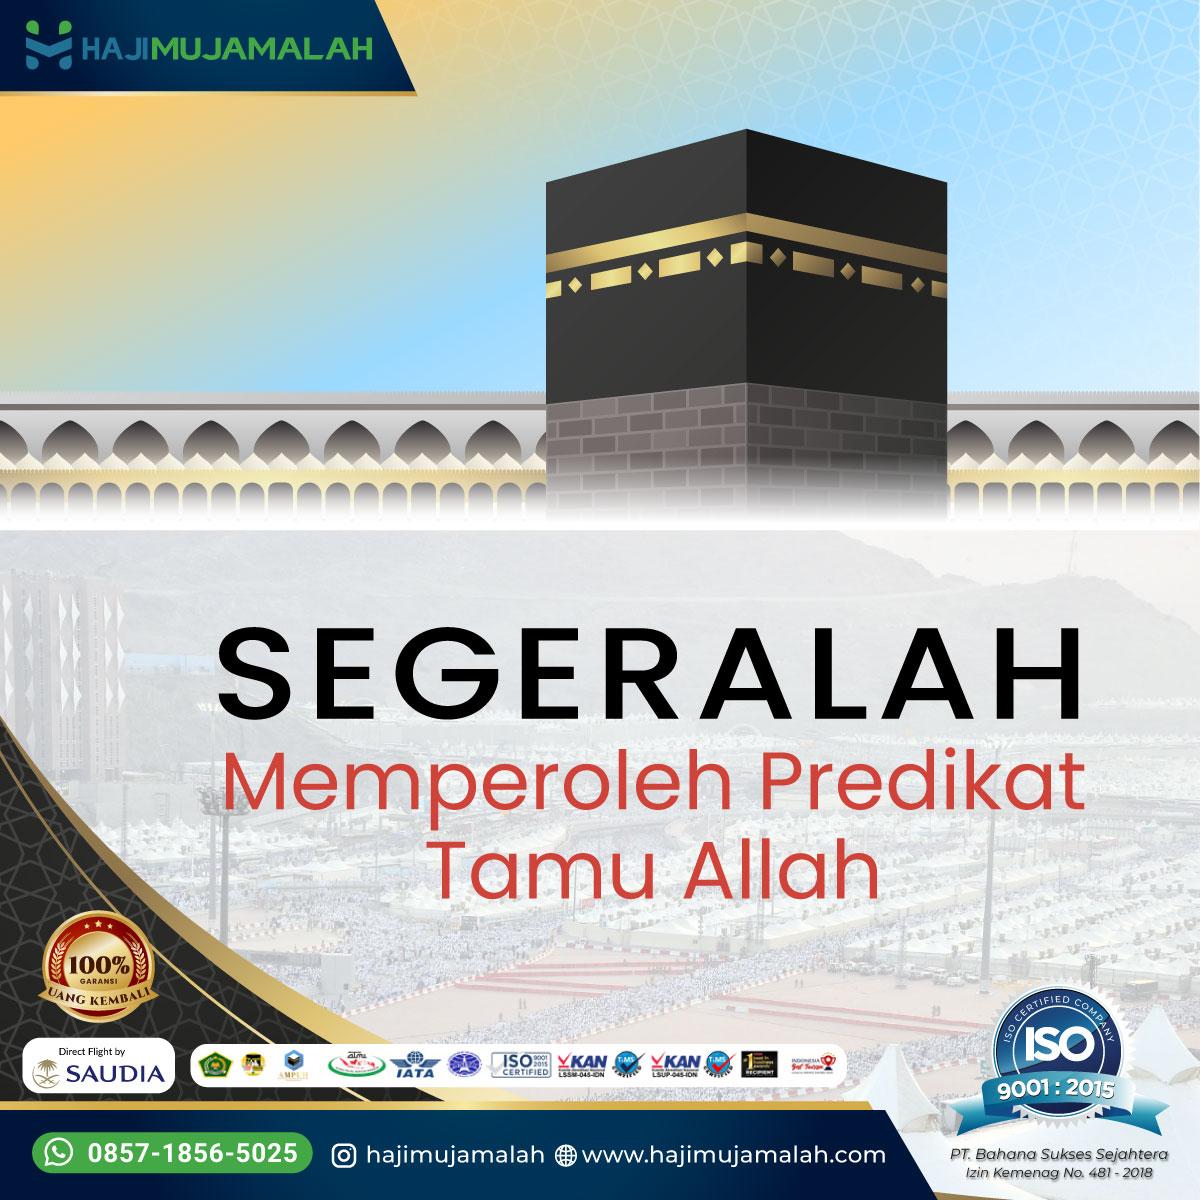 Bekal Haji - Segeralah Memperoleh Predikat Tamu Allah